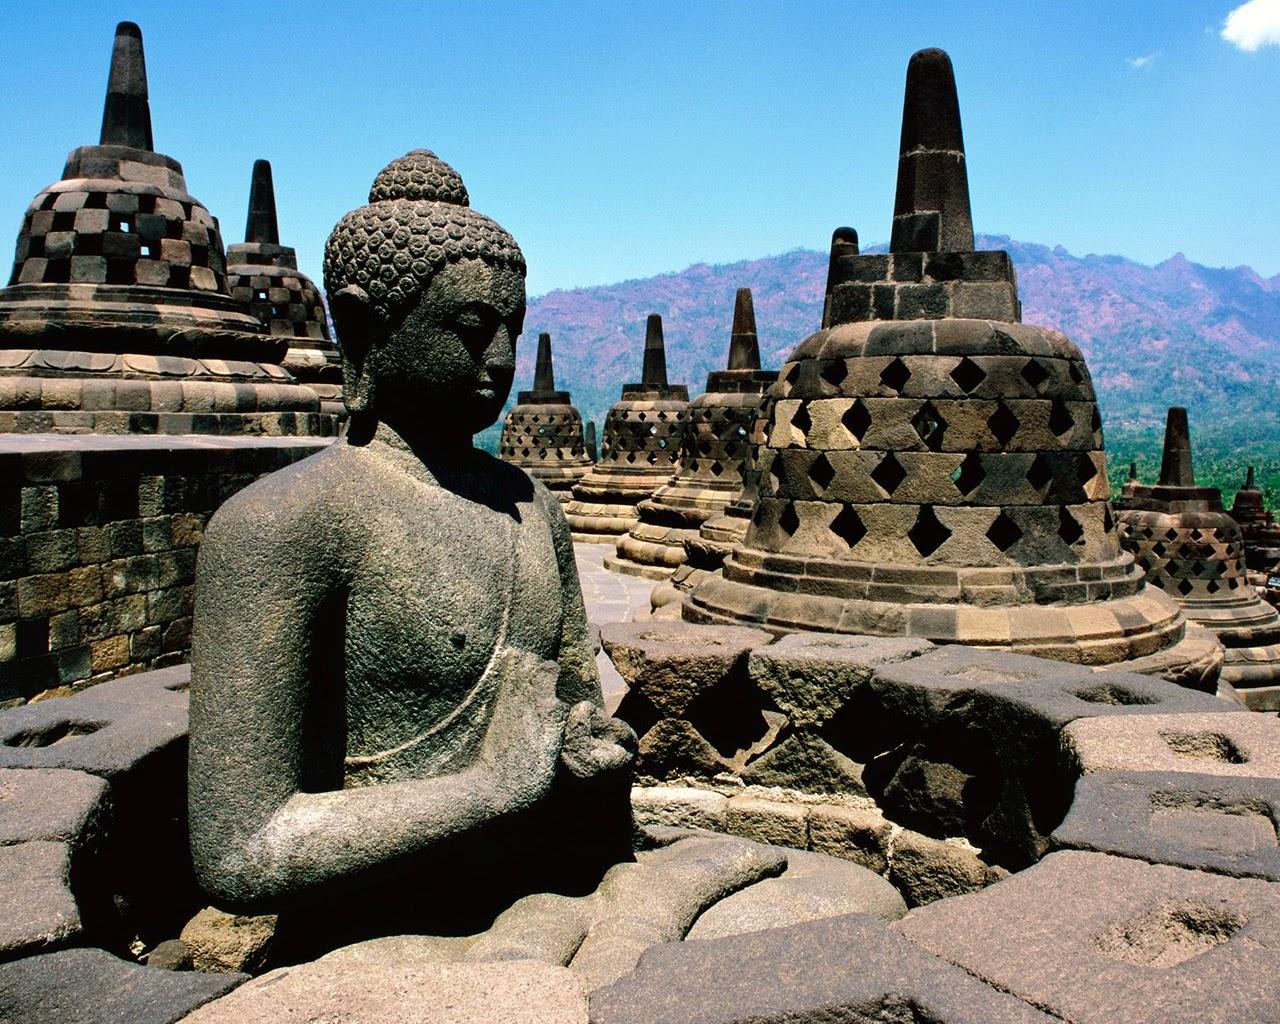 Temple Tourism in Yogyakarta